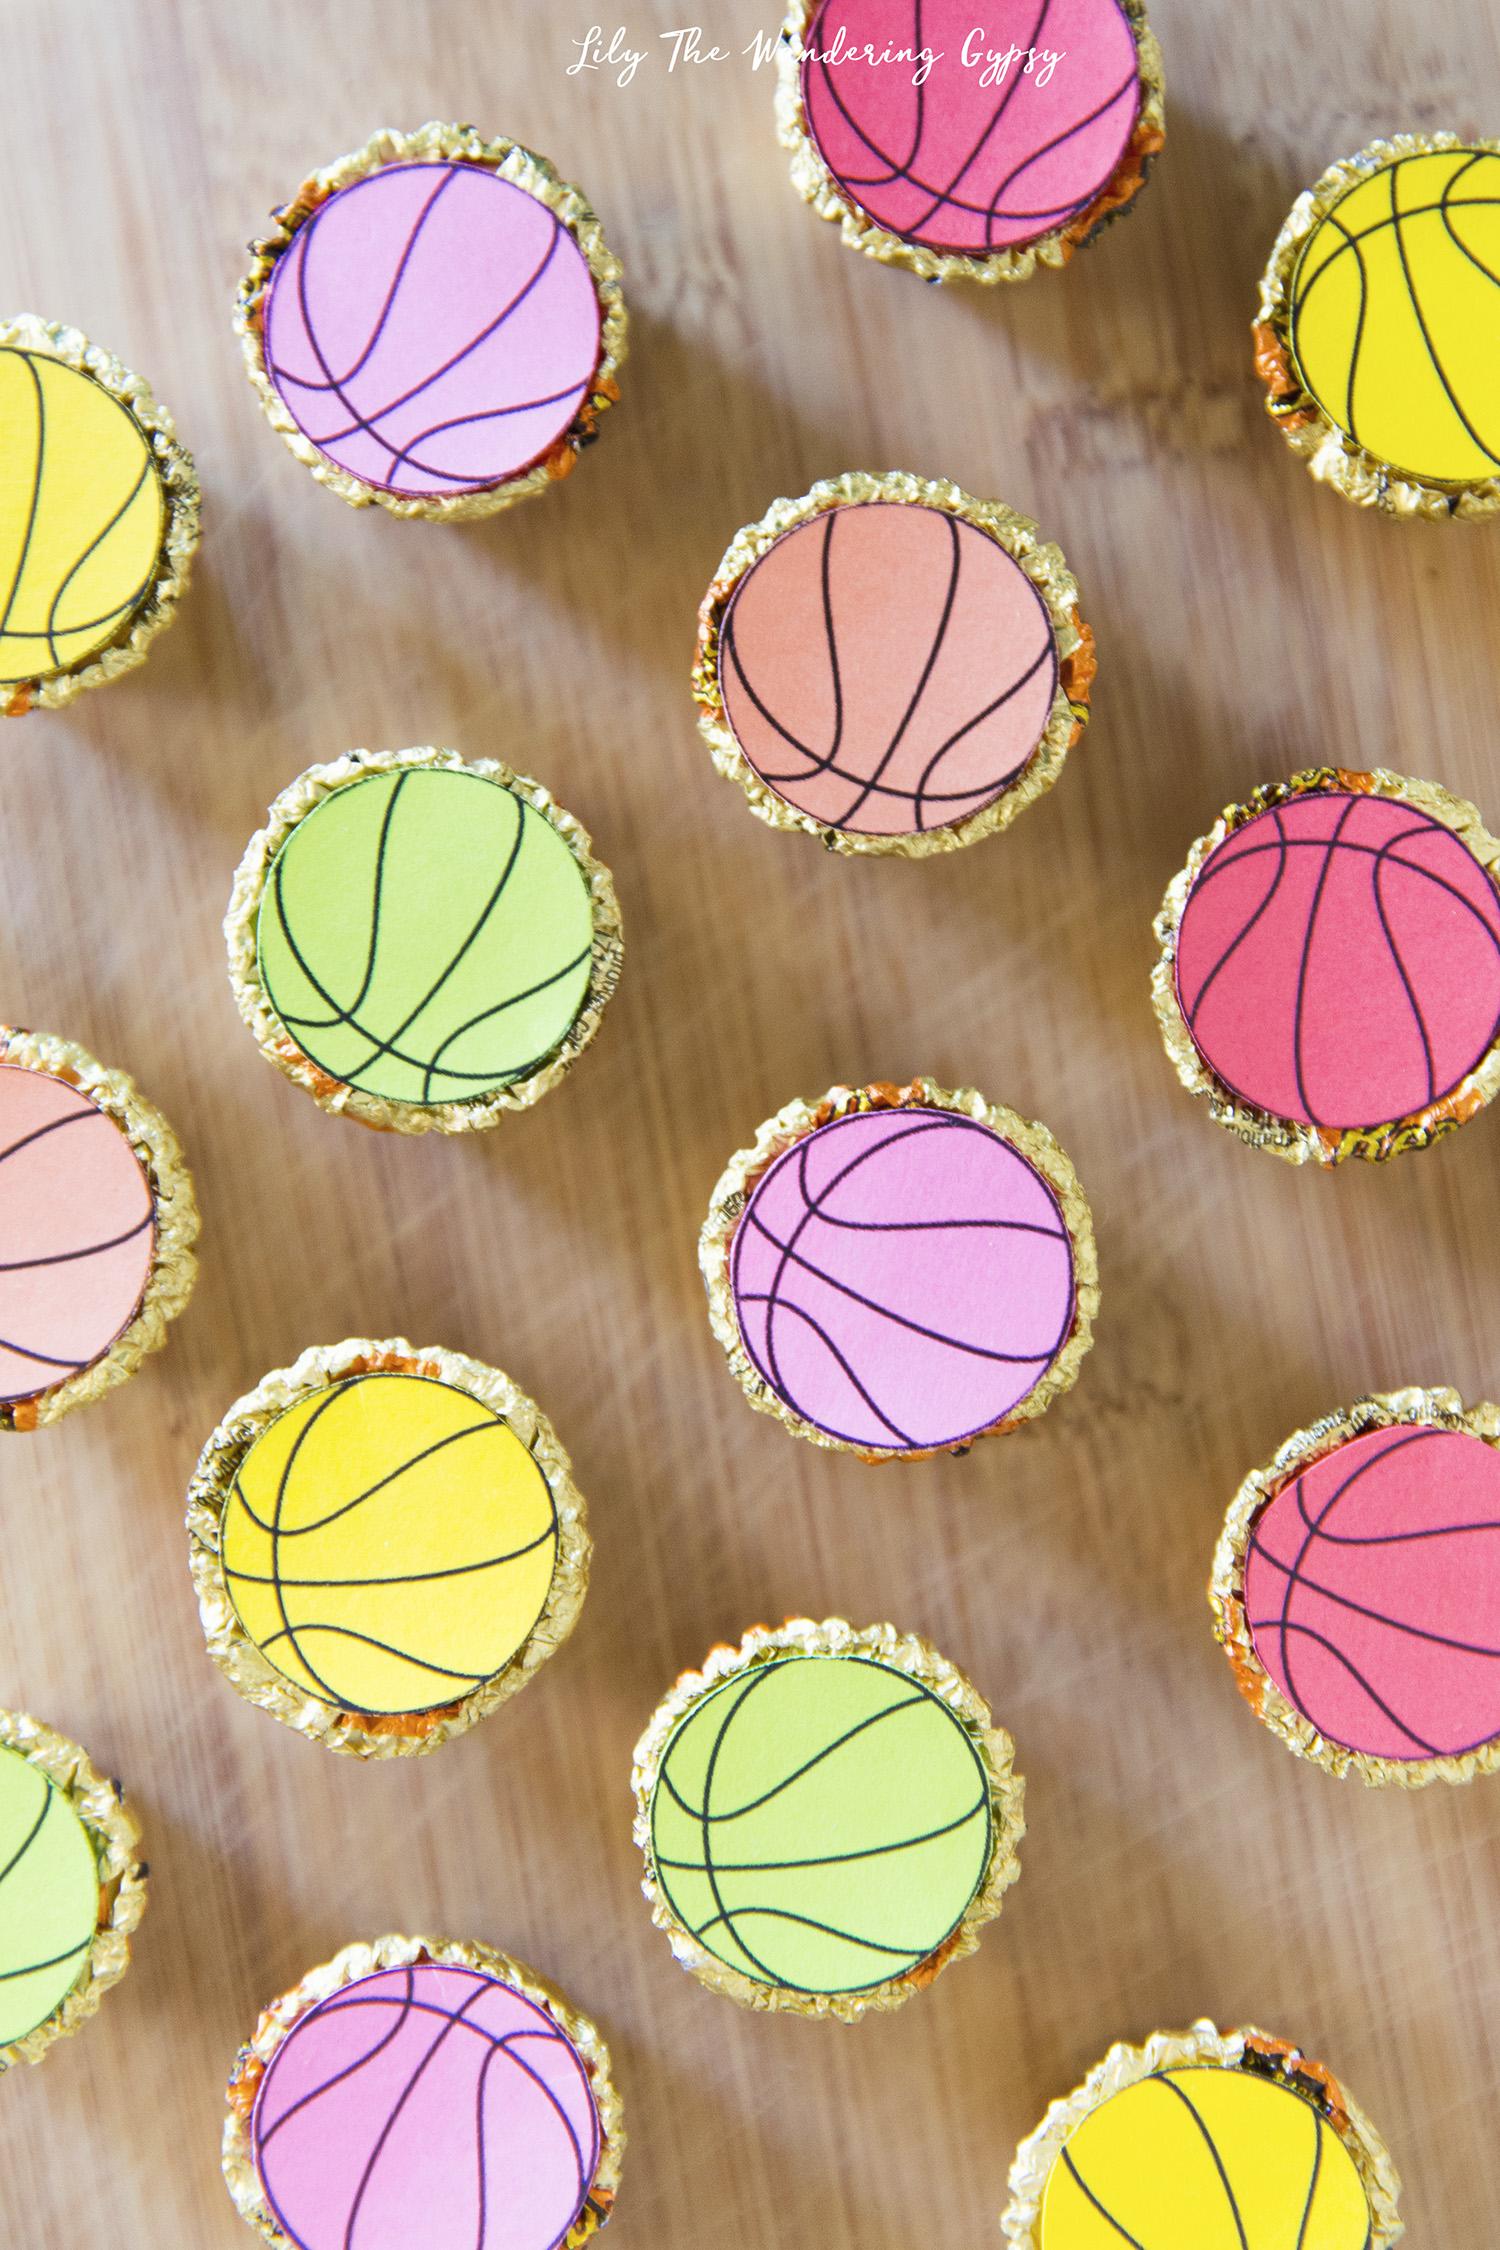 Basketball Party Ideas + Recipes